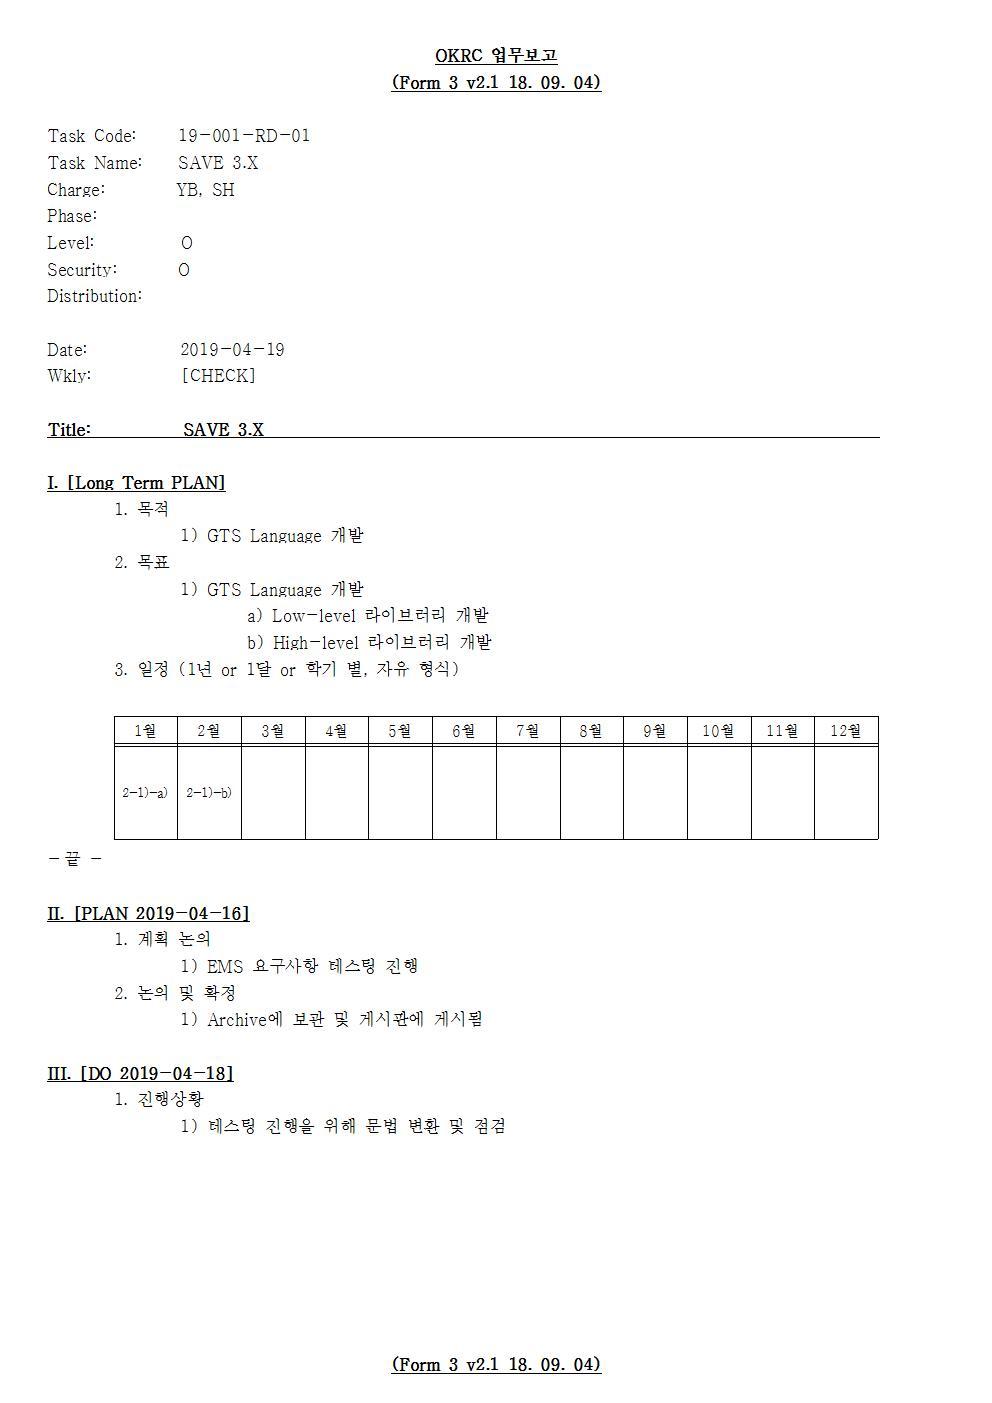 D-[19-001-RD-01]-[SAVE 3.X]-[2019-04-19][SH]001.jpg